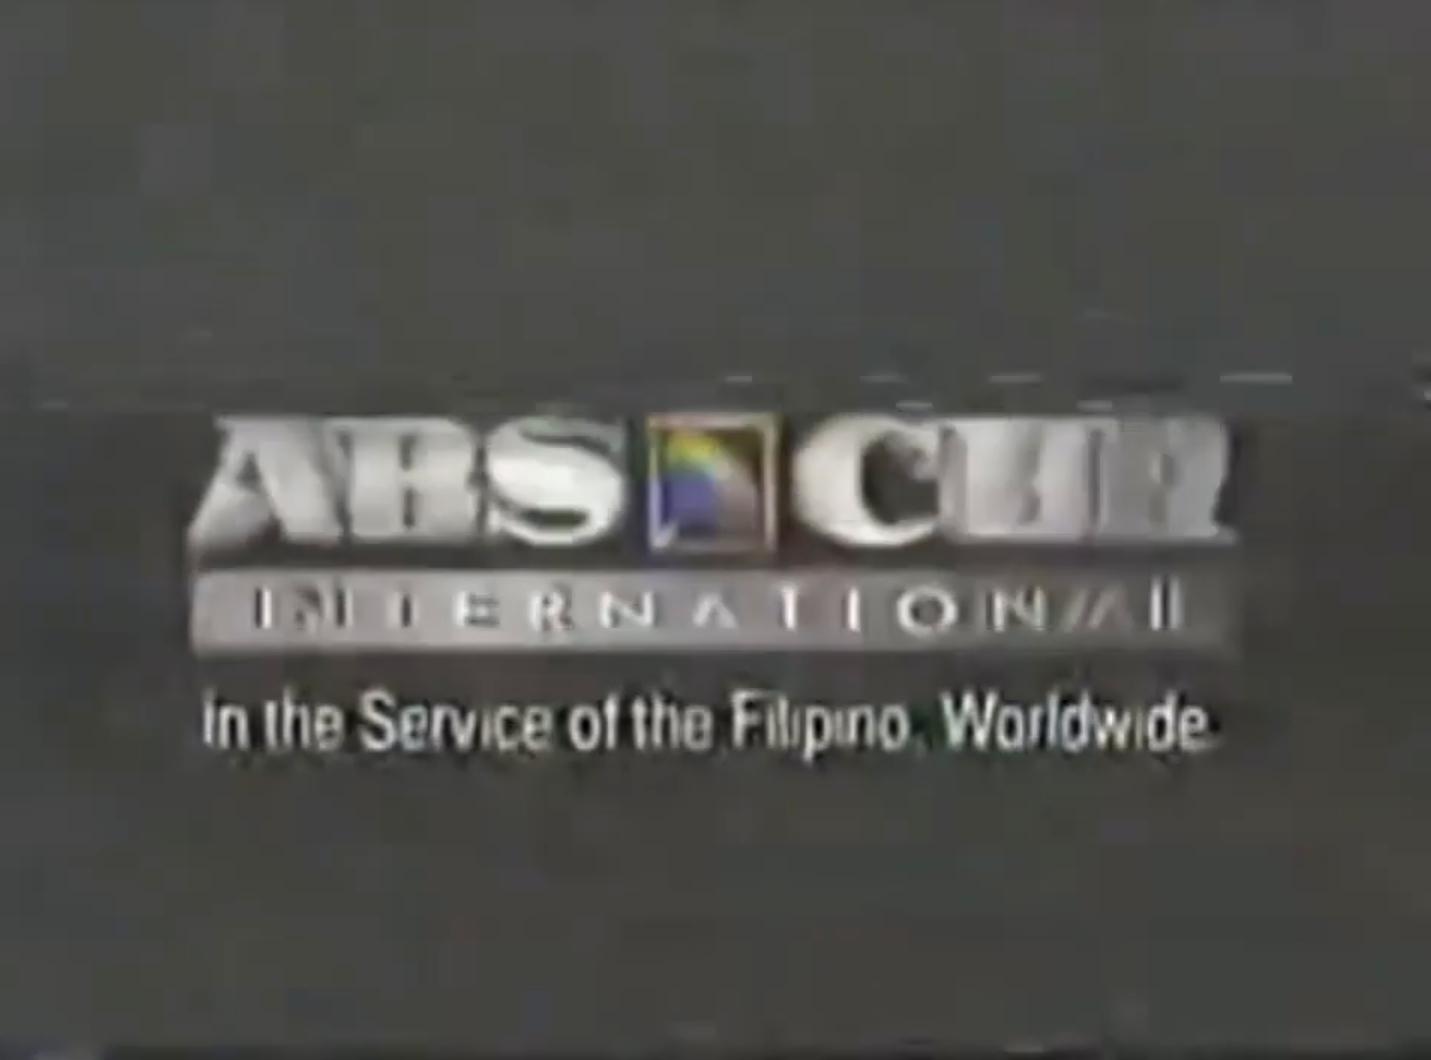 ABS-CBN International